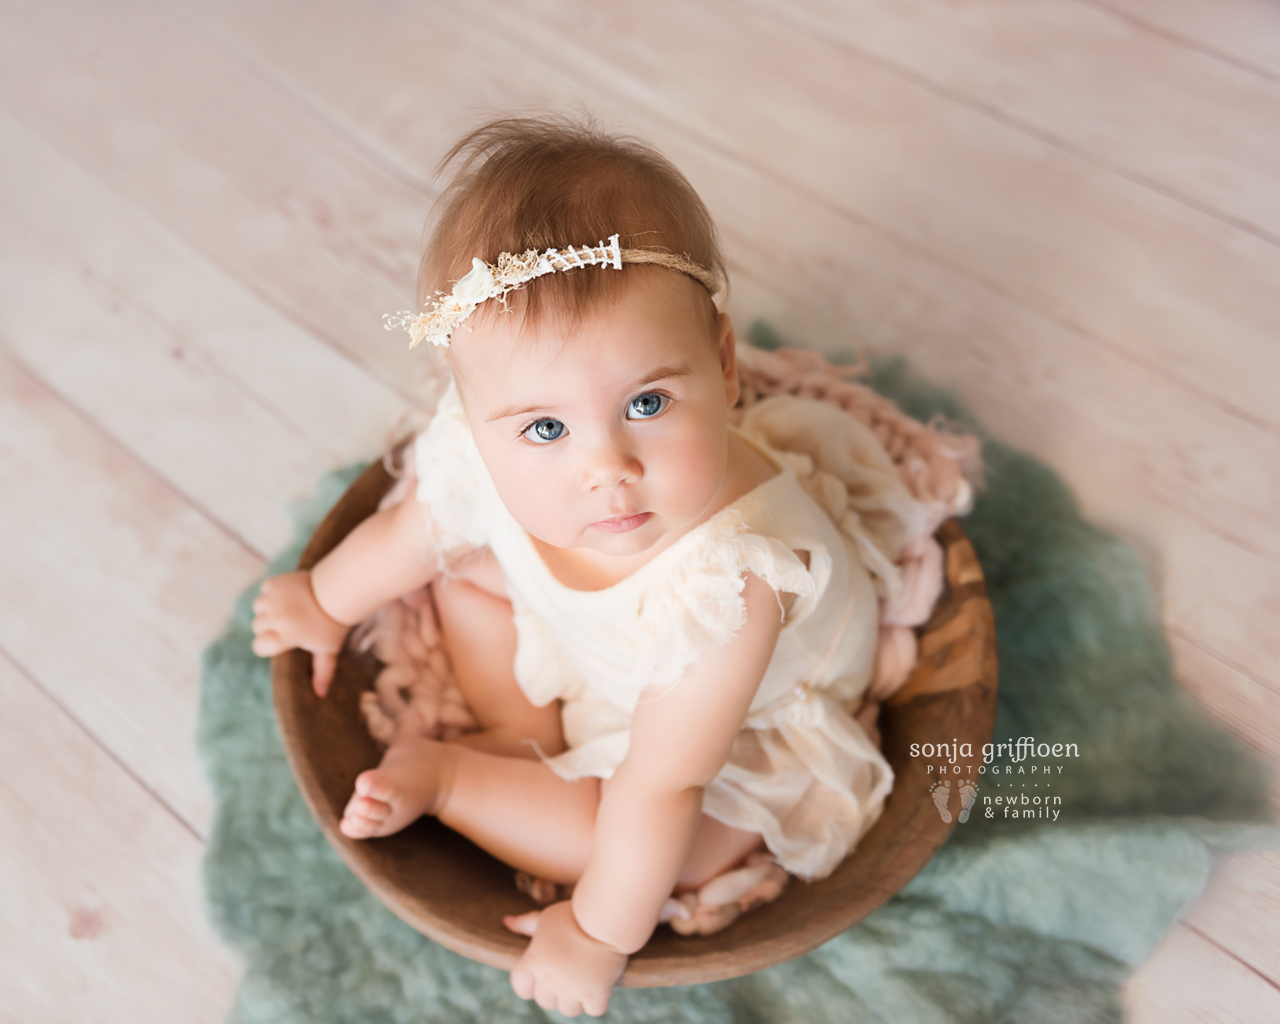 Thalia-Milestone-Brisbane-Newborn-Photographer-Sonja-Griffioen-10.jpg